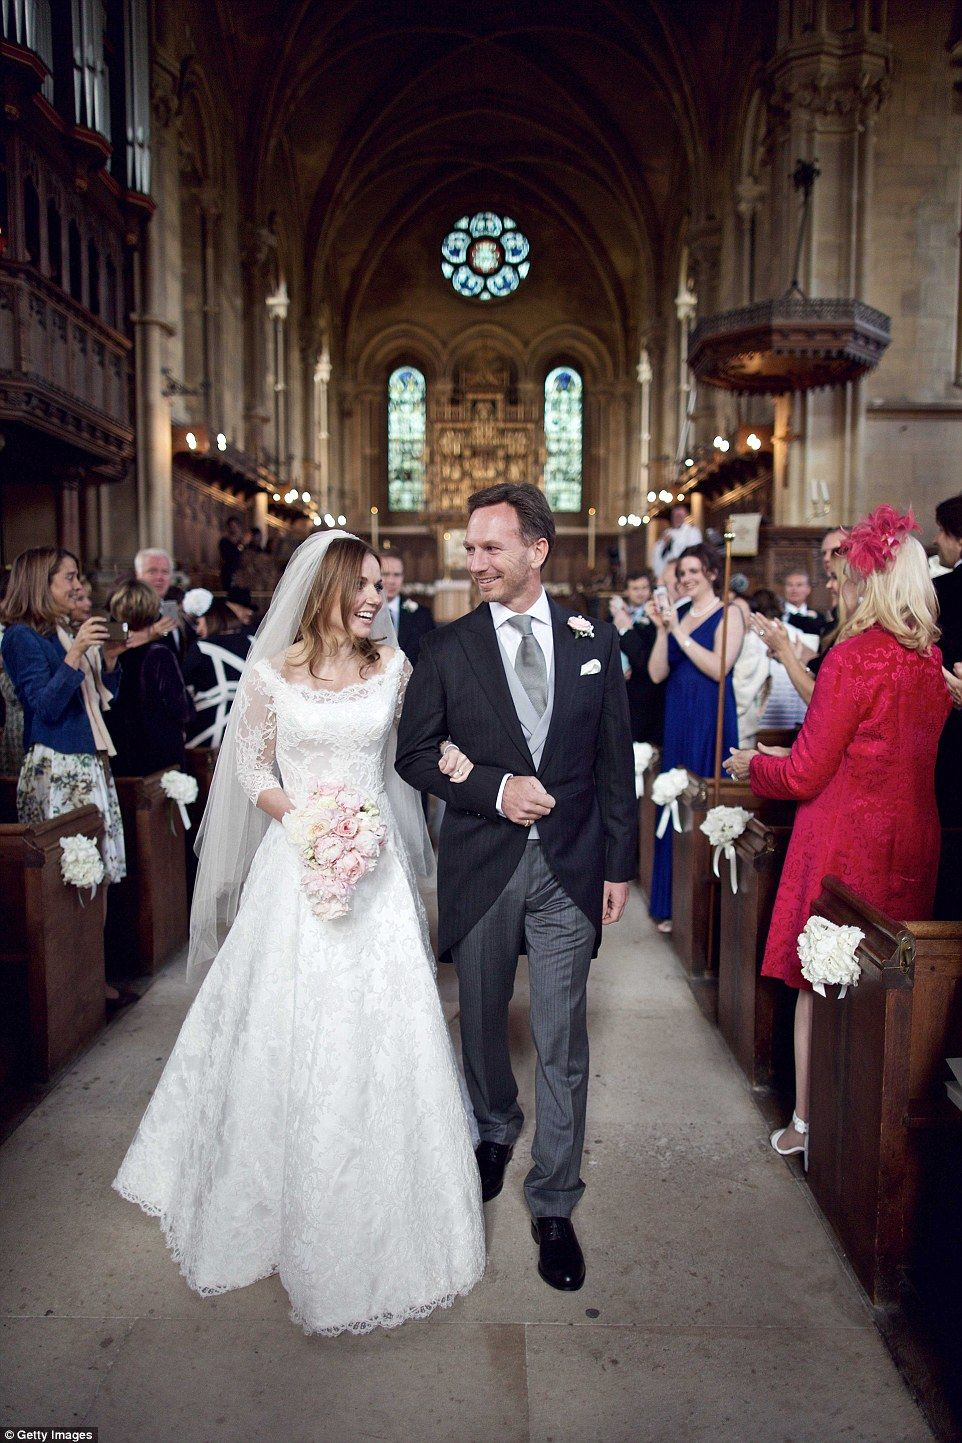 Geri halliwell kisses husband christian horner after church wedding